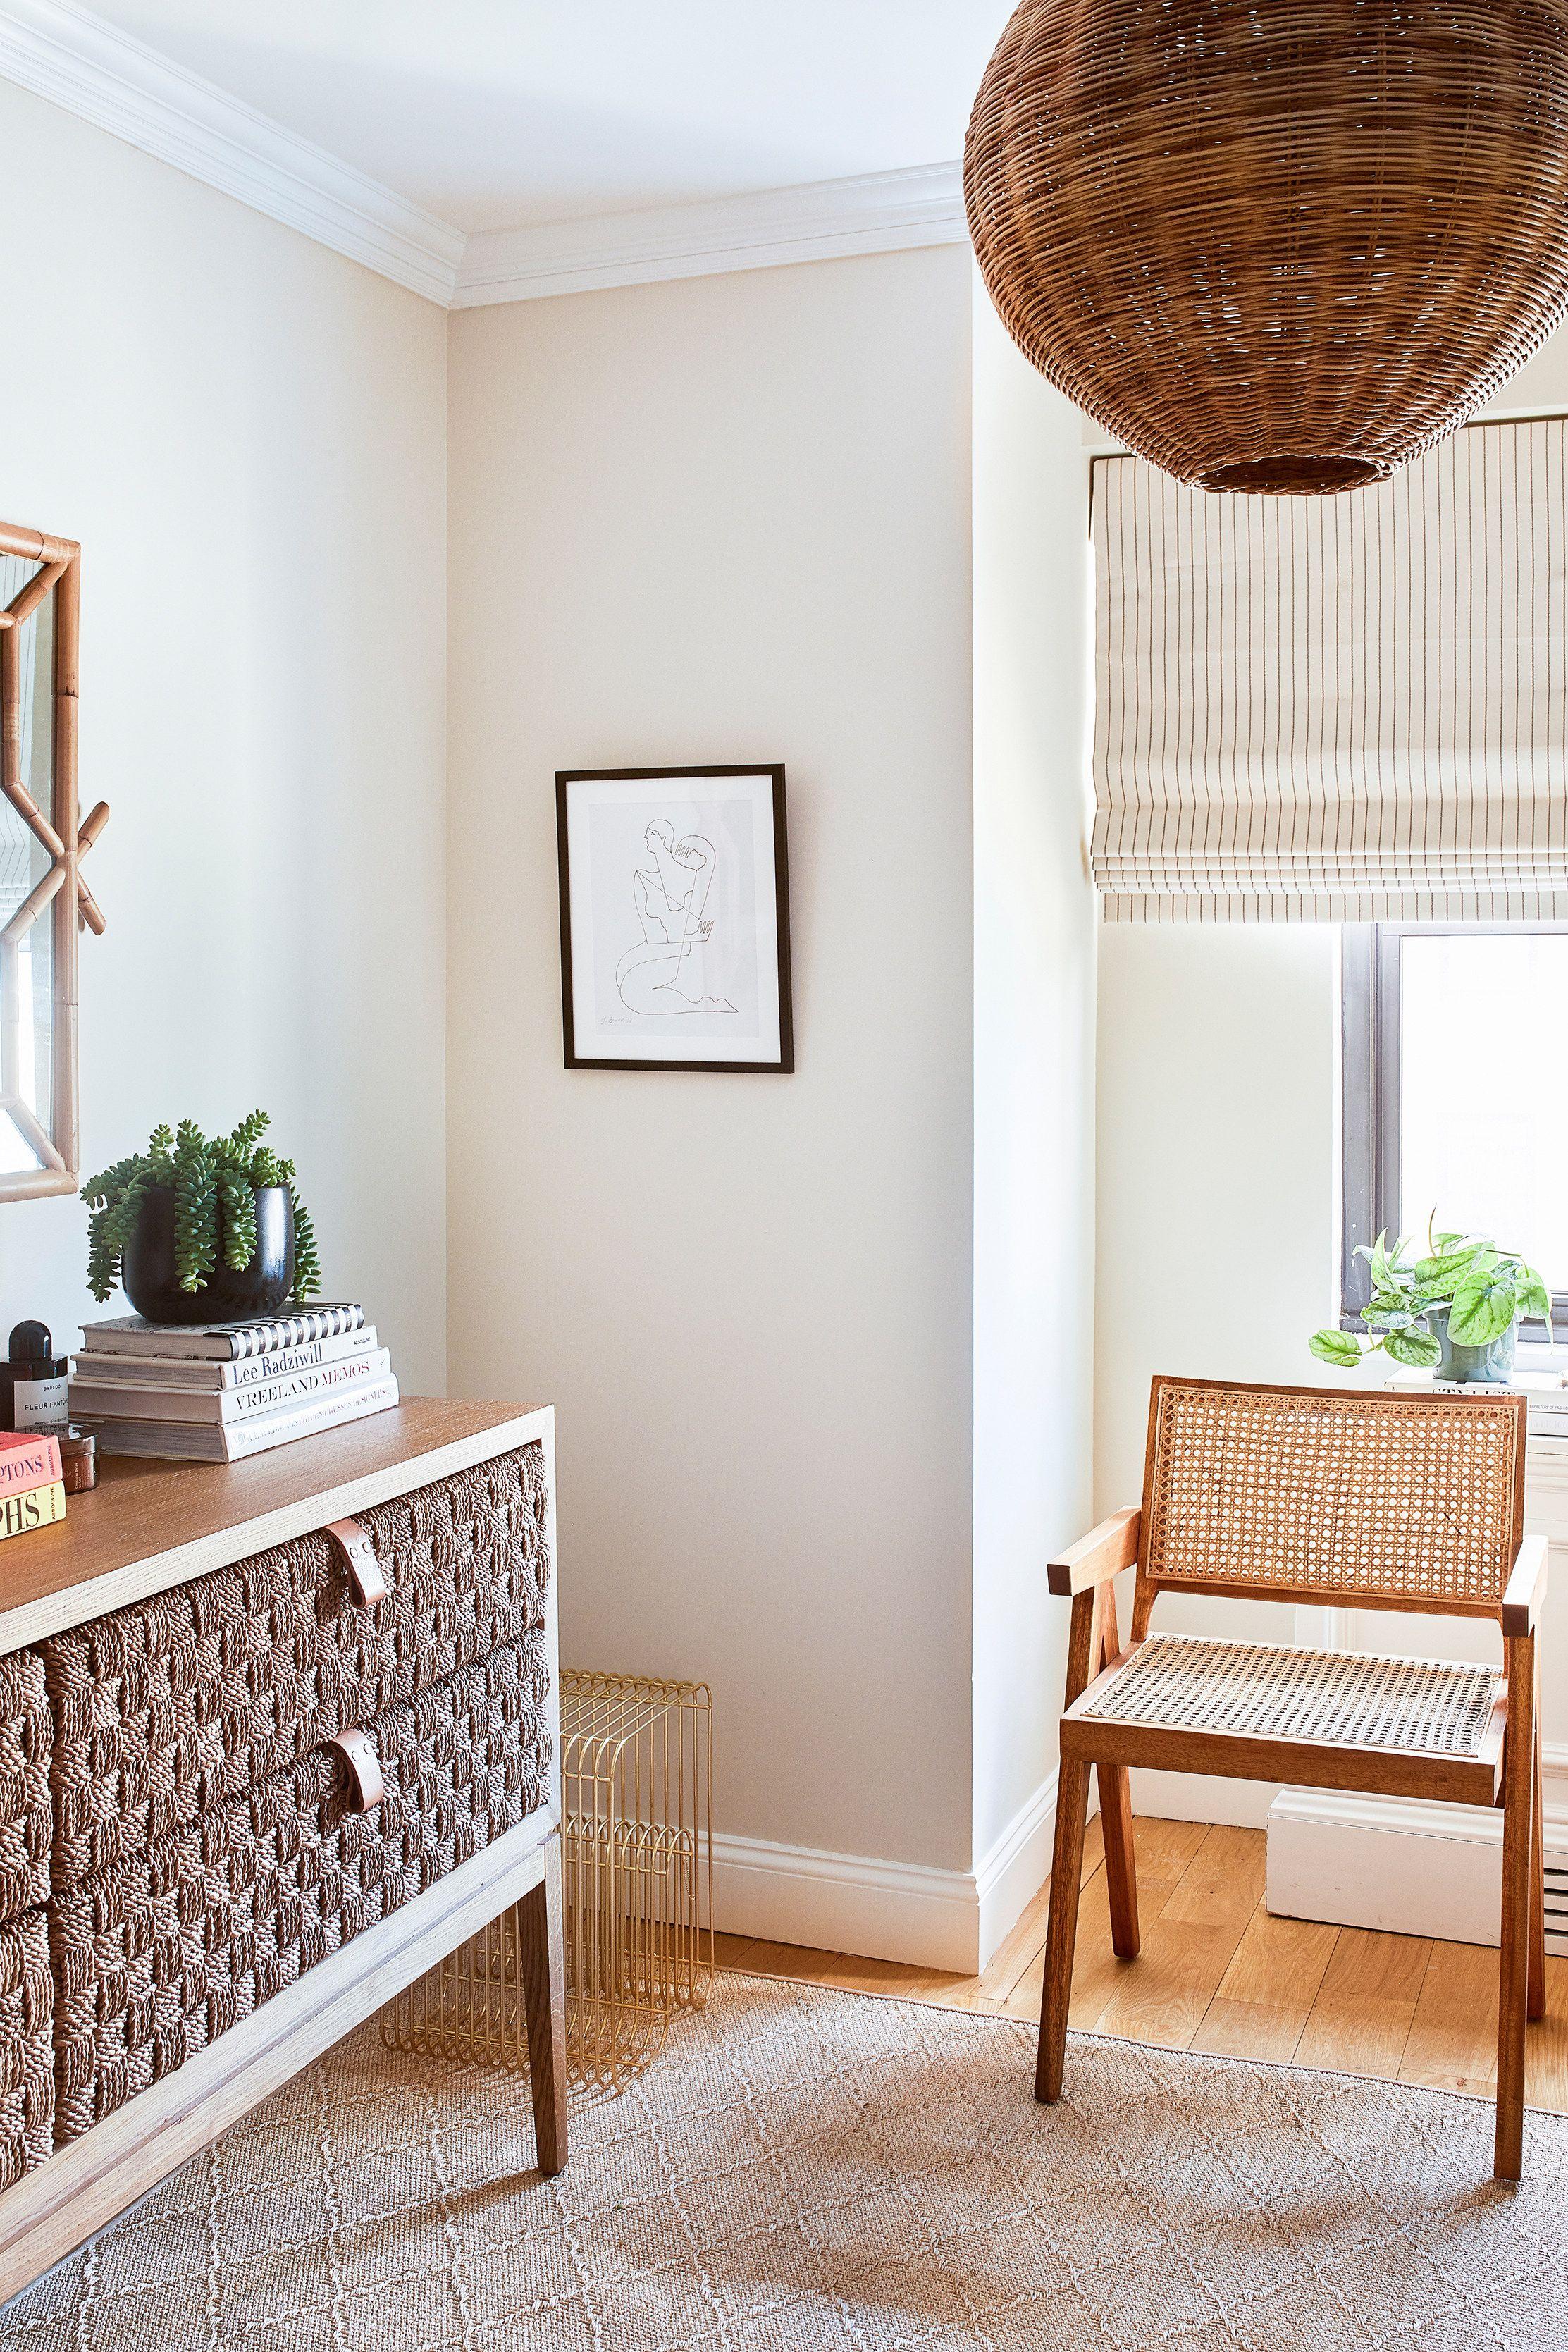 Peek Inside Ariel Okin's New York City Home